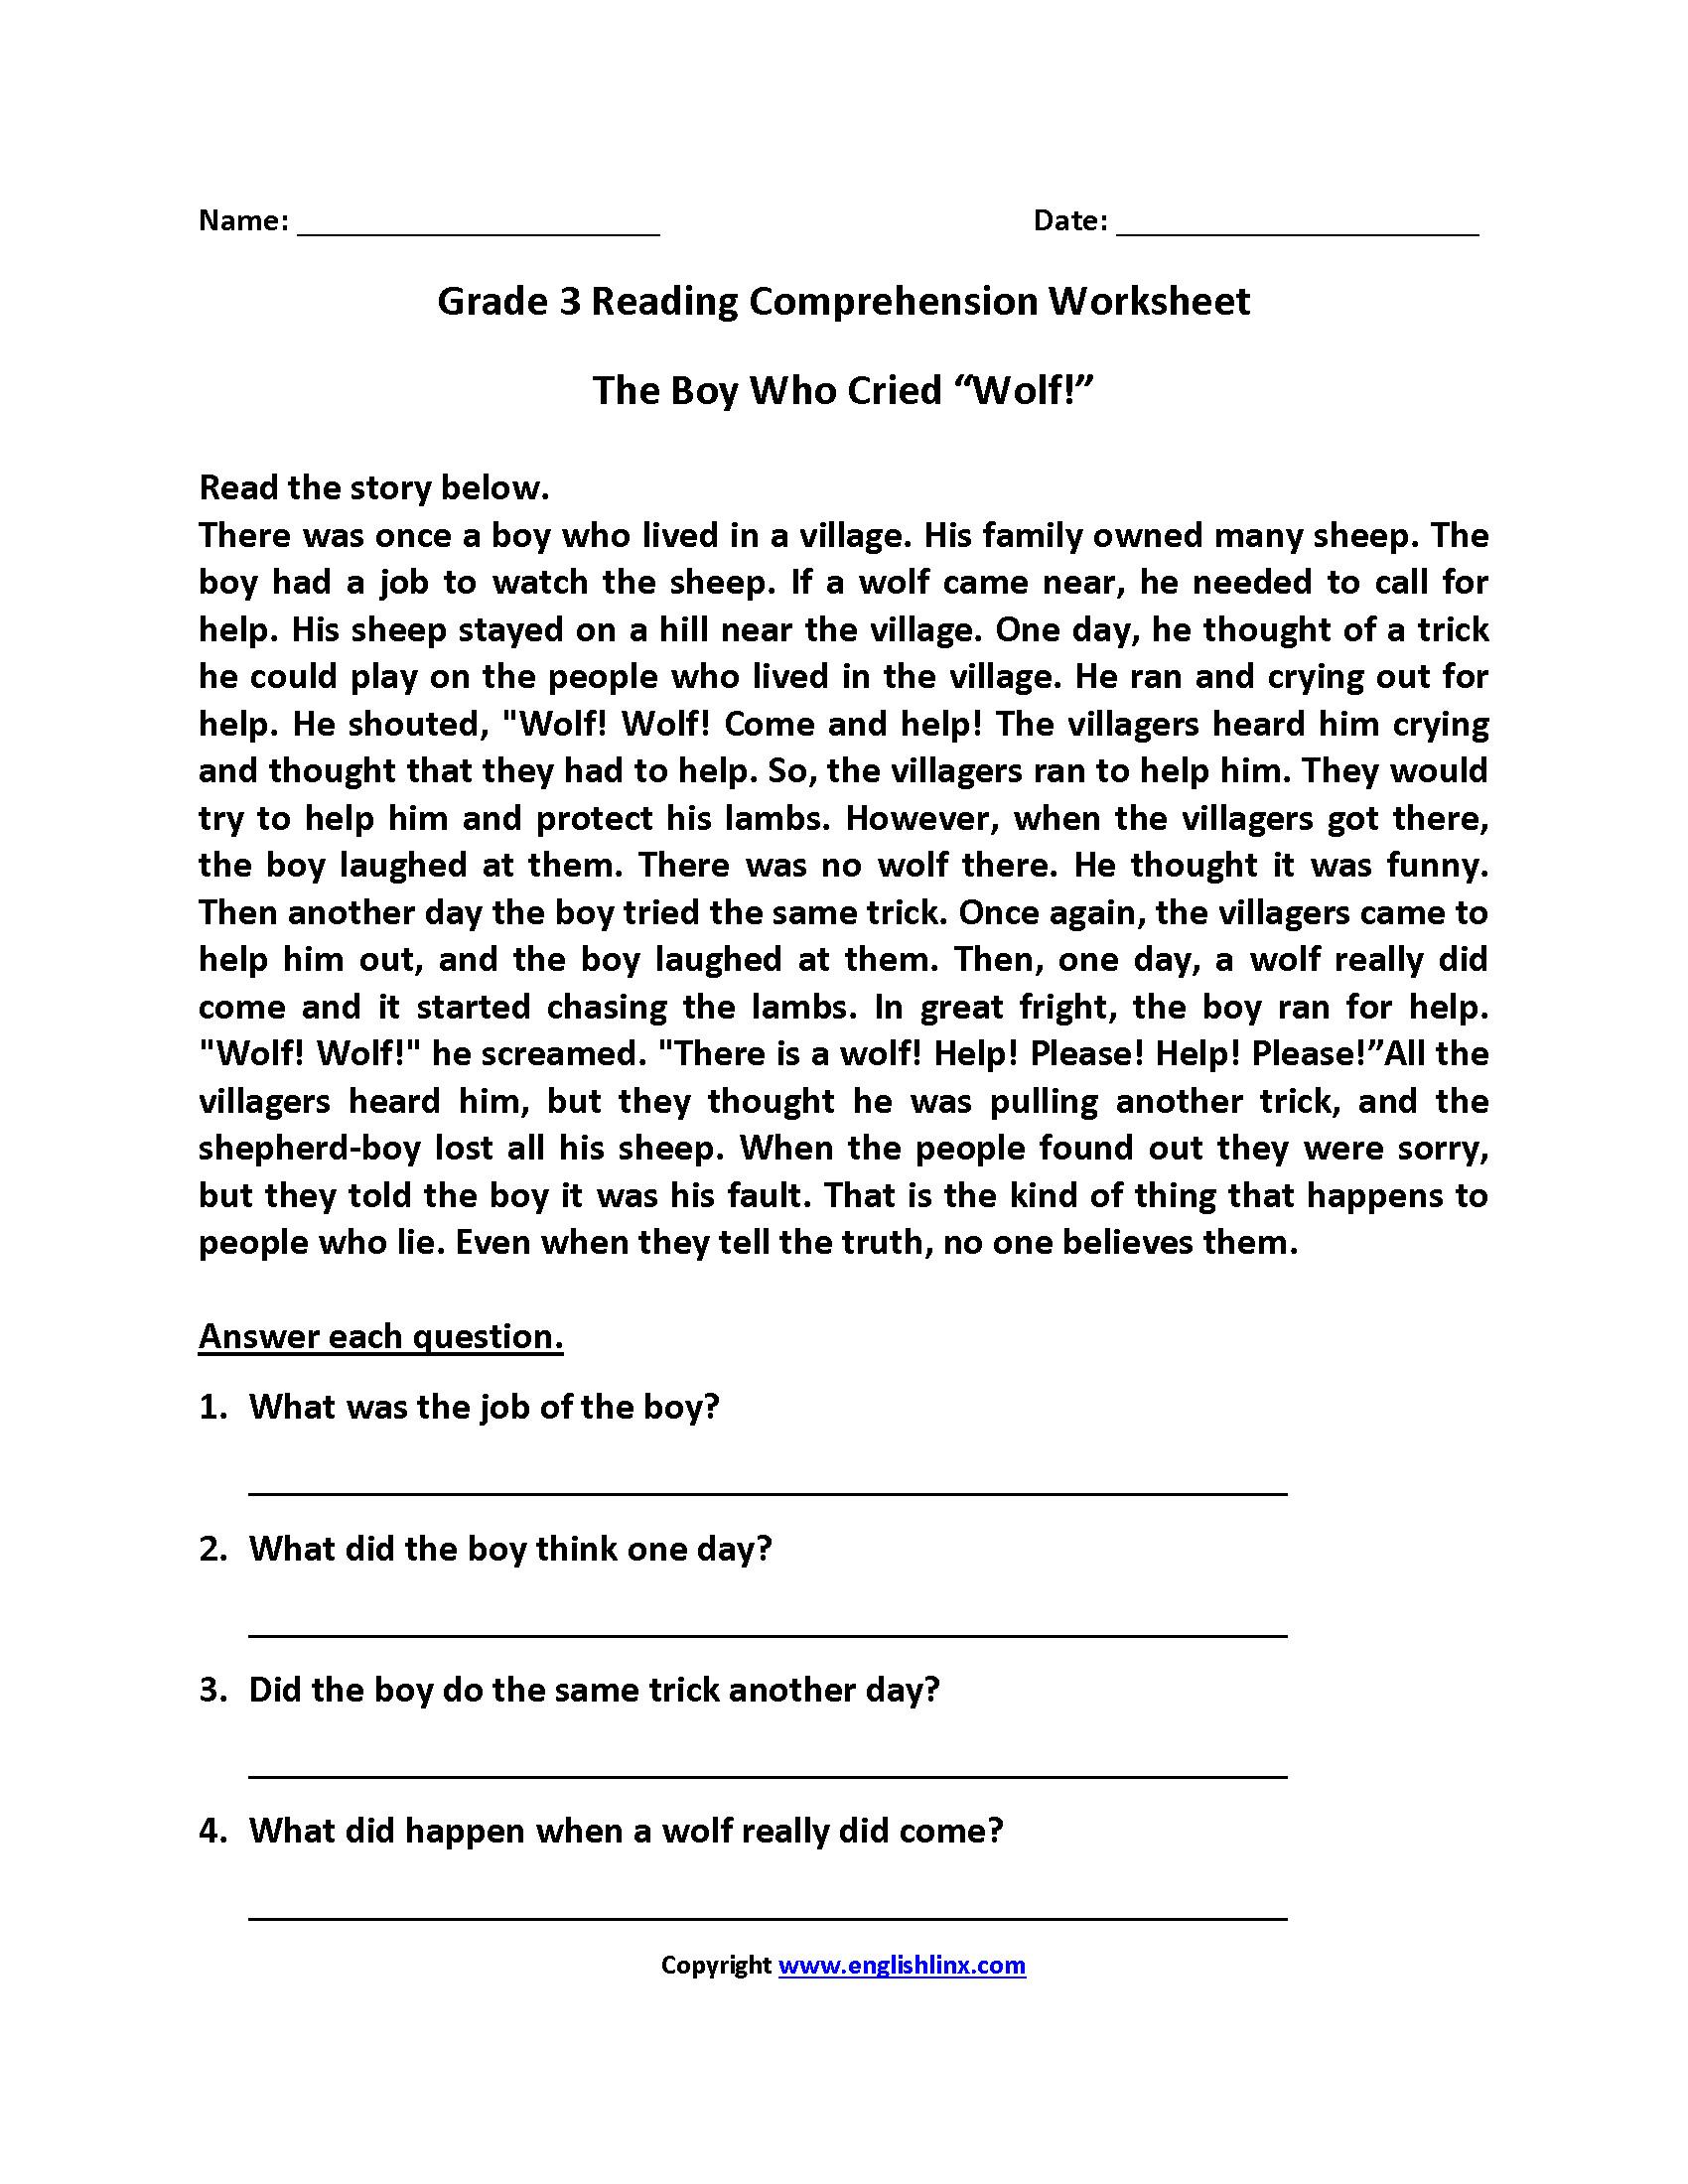 3 Reading Comprehension Worksheets Third Grade 3